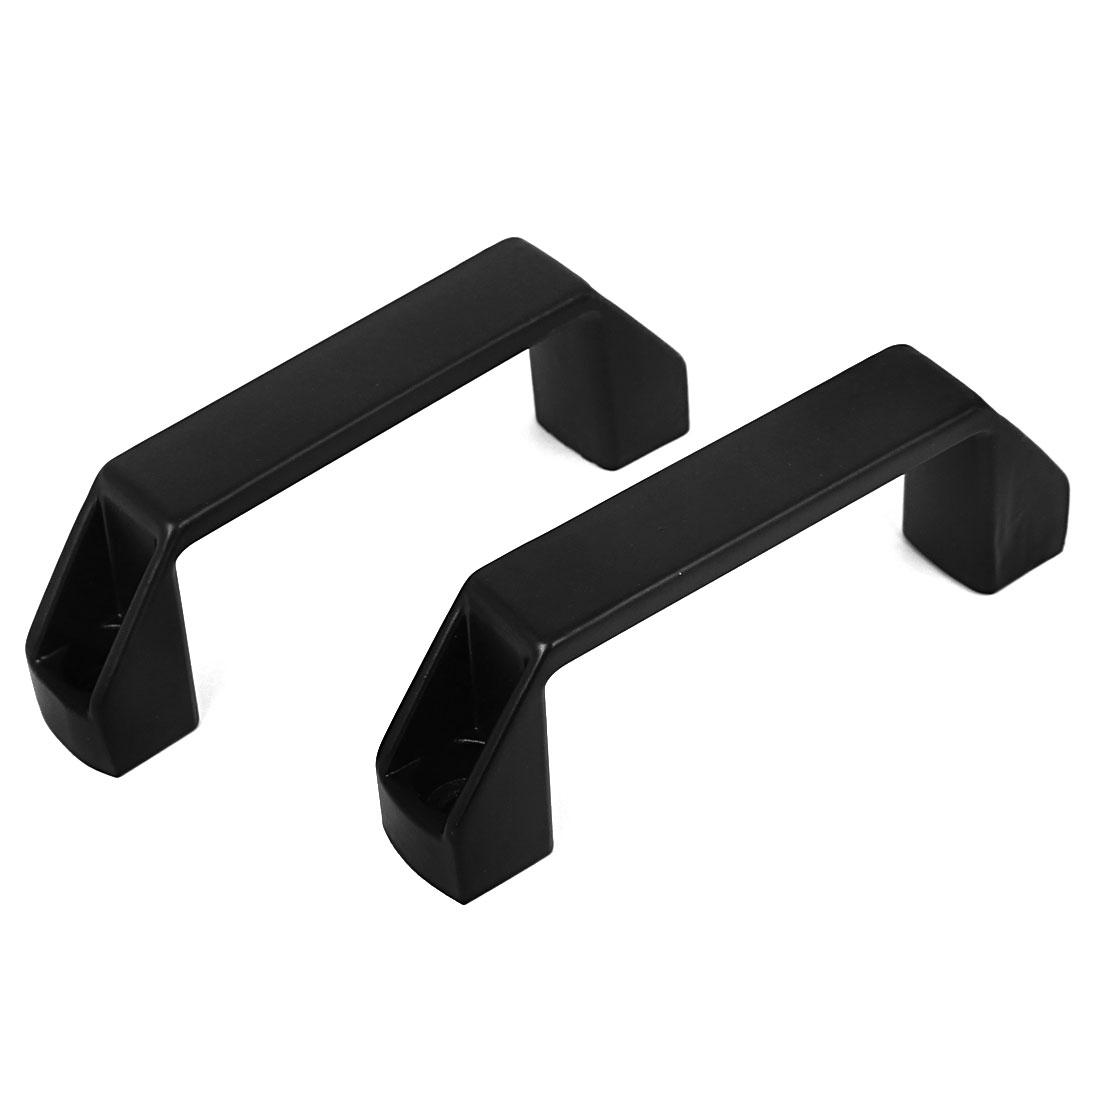 "2pcs 4.2"" Long Rectangle Zinc Alloy Pull Handle Knob Black for Cabinet Cupboard"